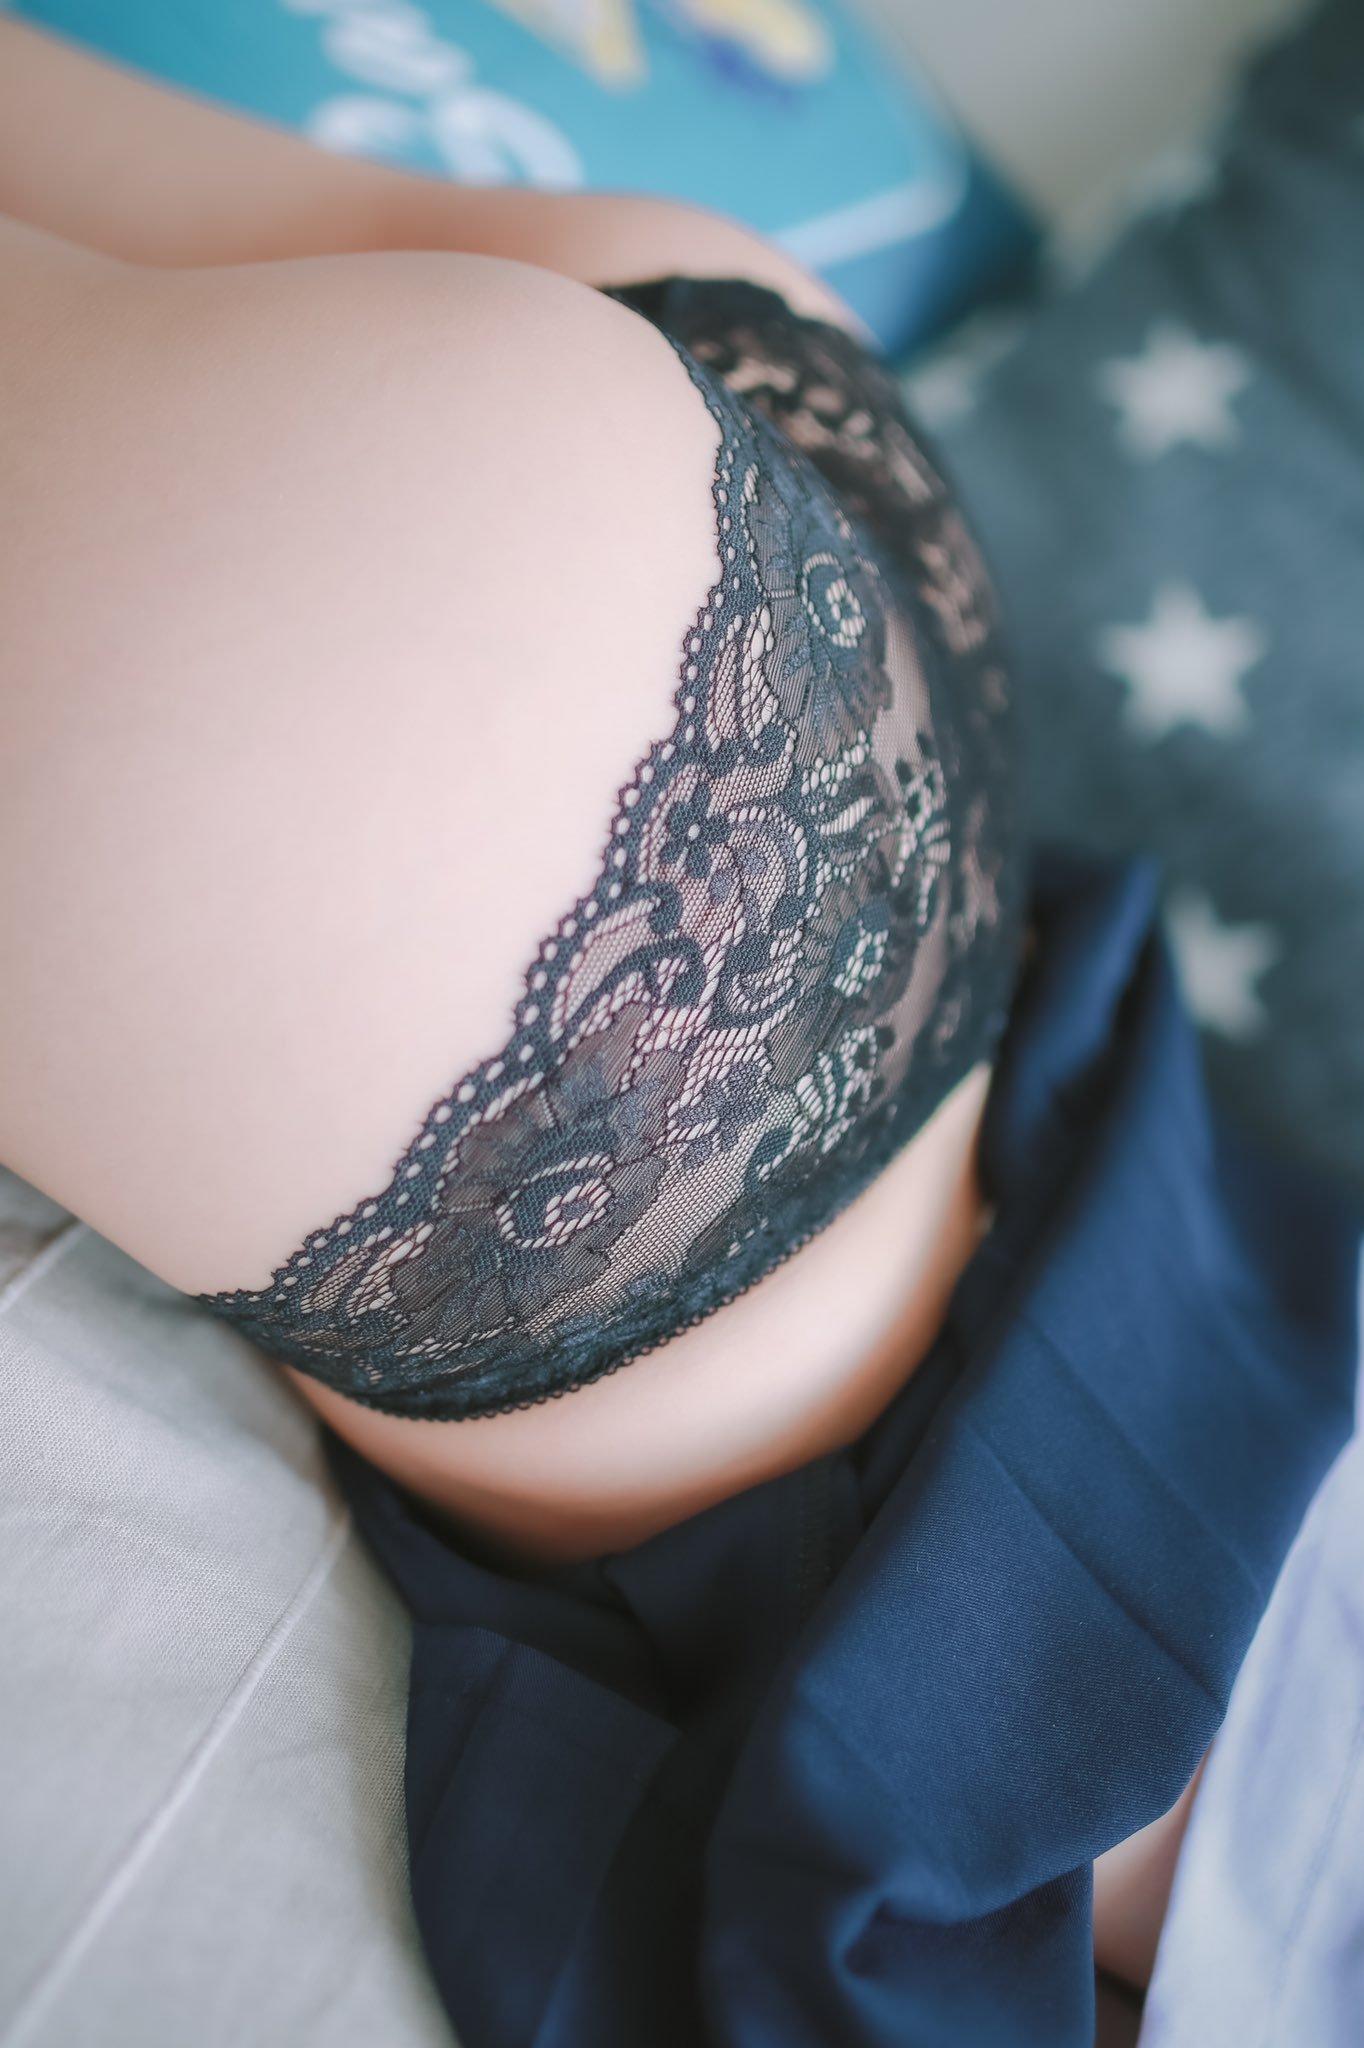 JK制服有趣内衣 夏日软妹青春无限